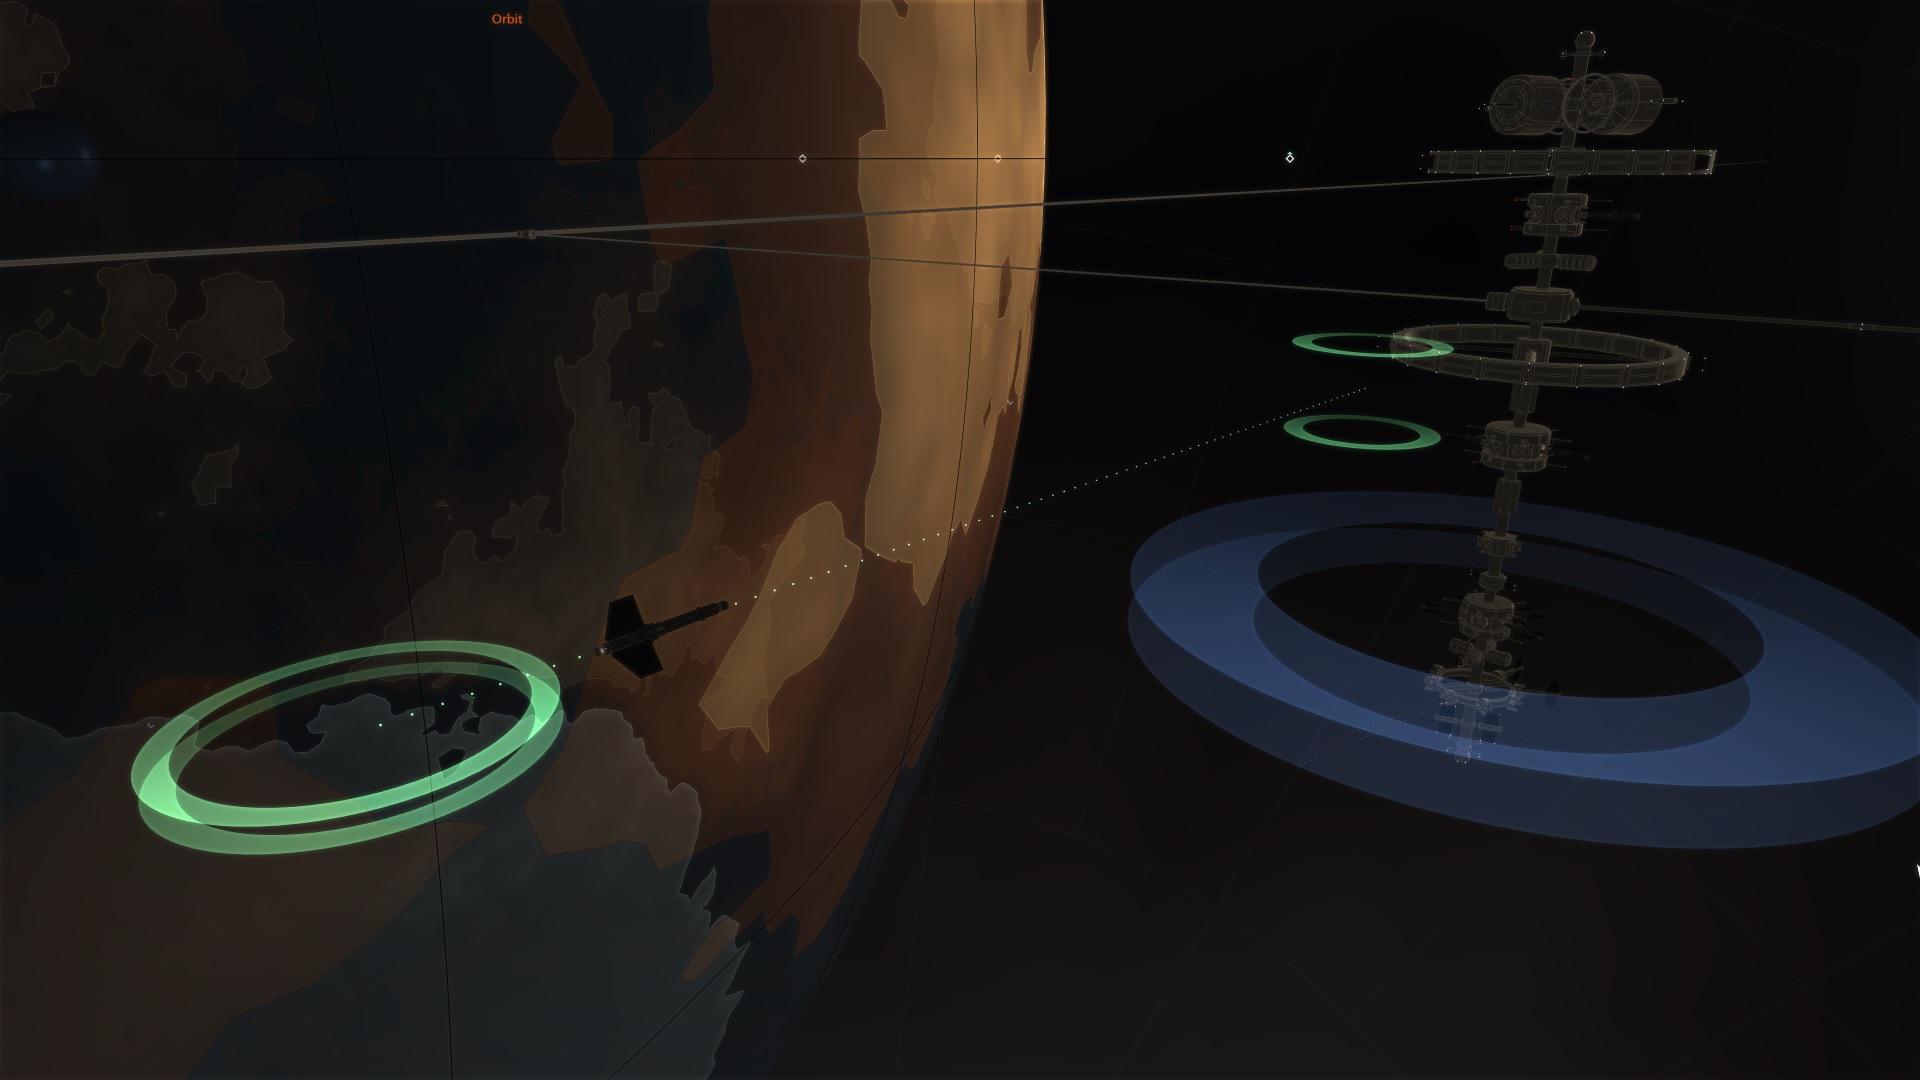 Orbital Traffic Control